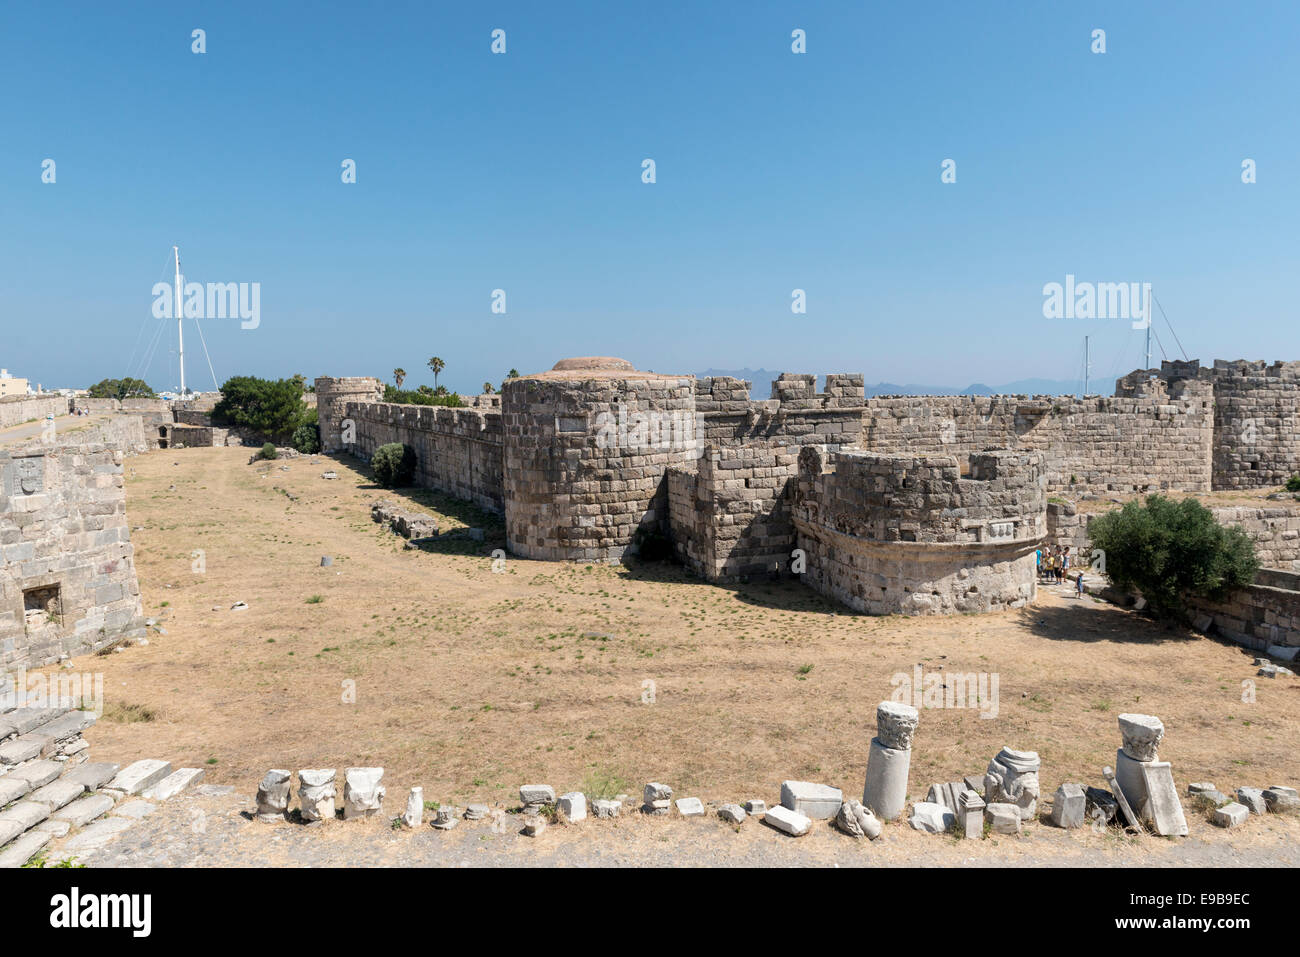 Nerantzia or Saint John Knights castle in Kos, island of Kos, Greece - Stock Image